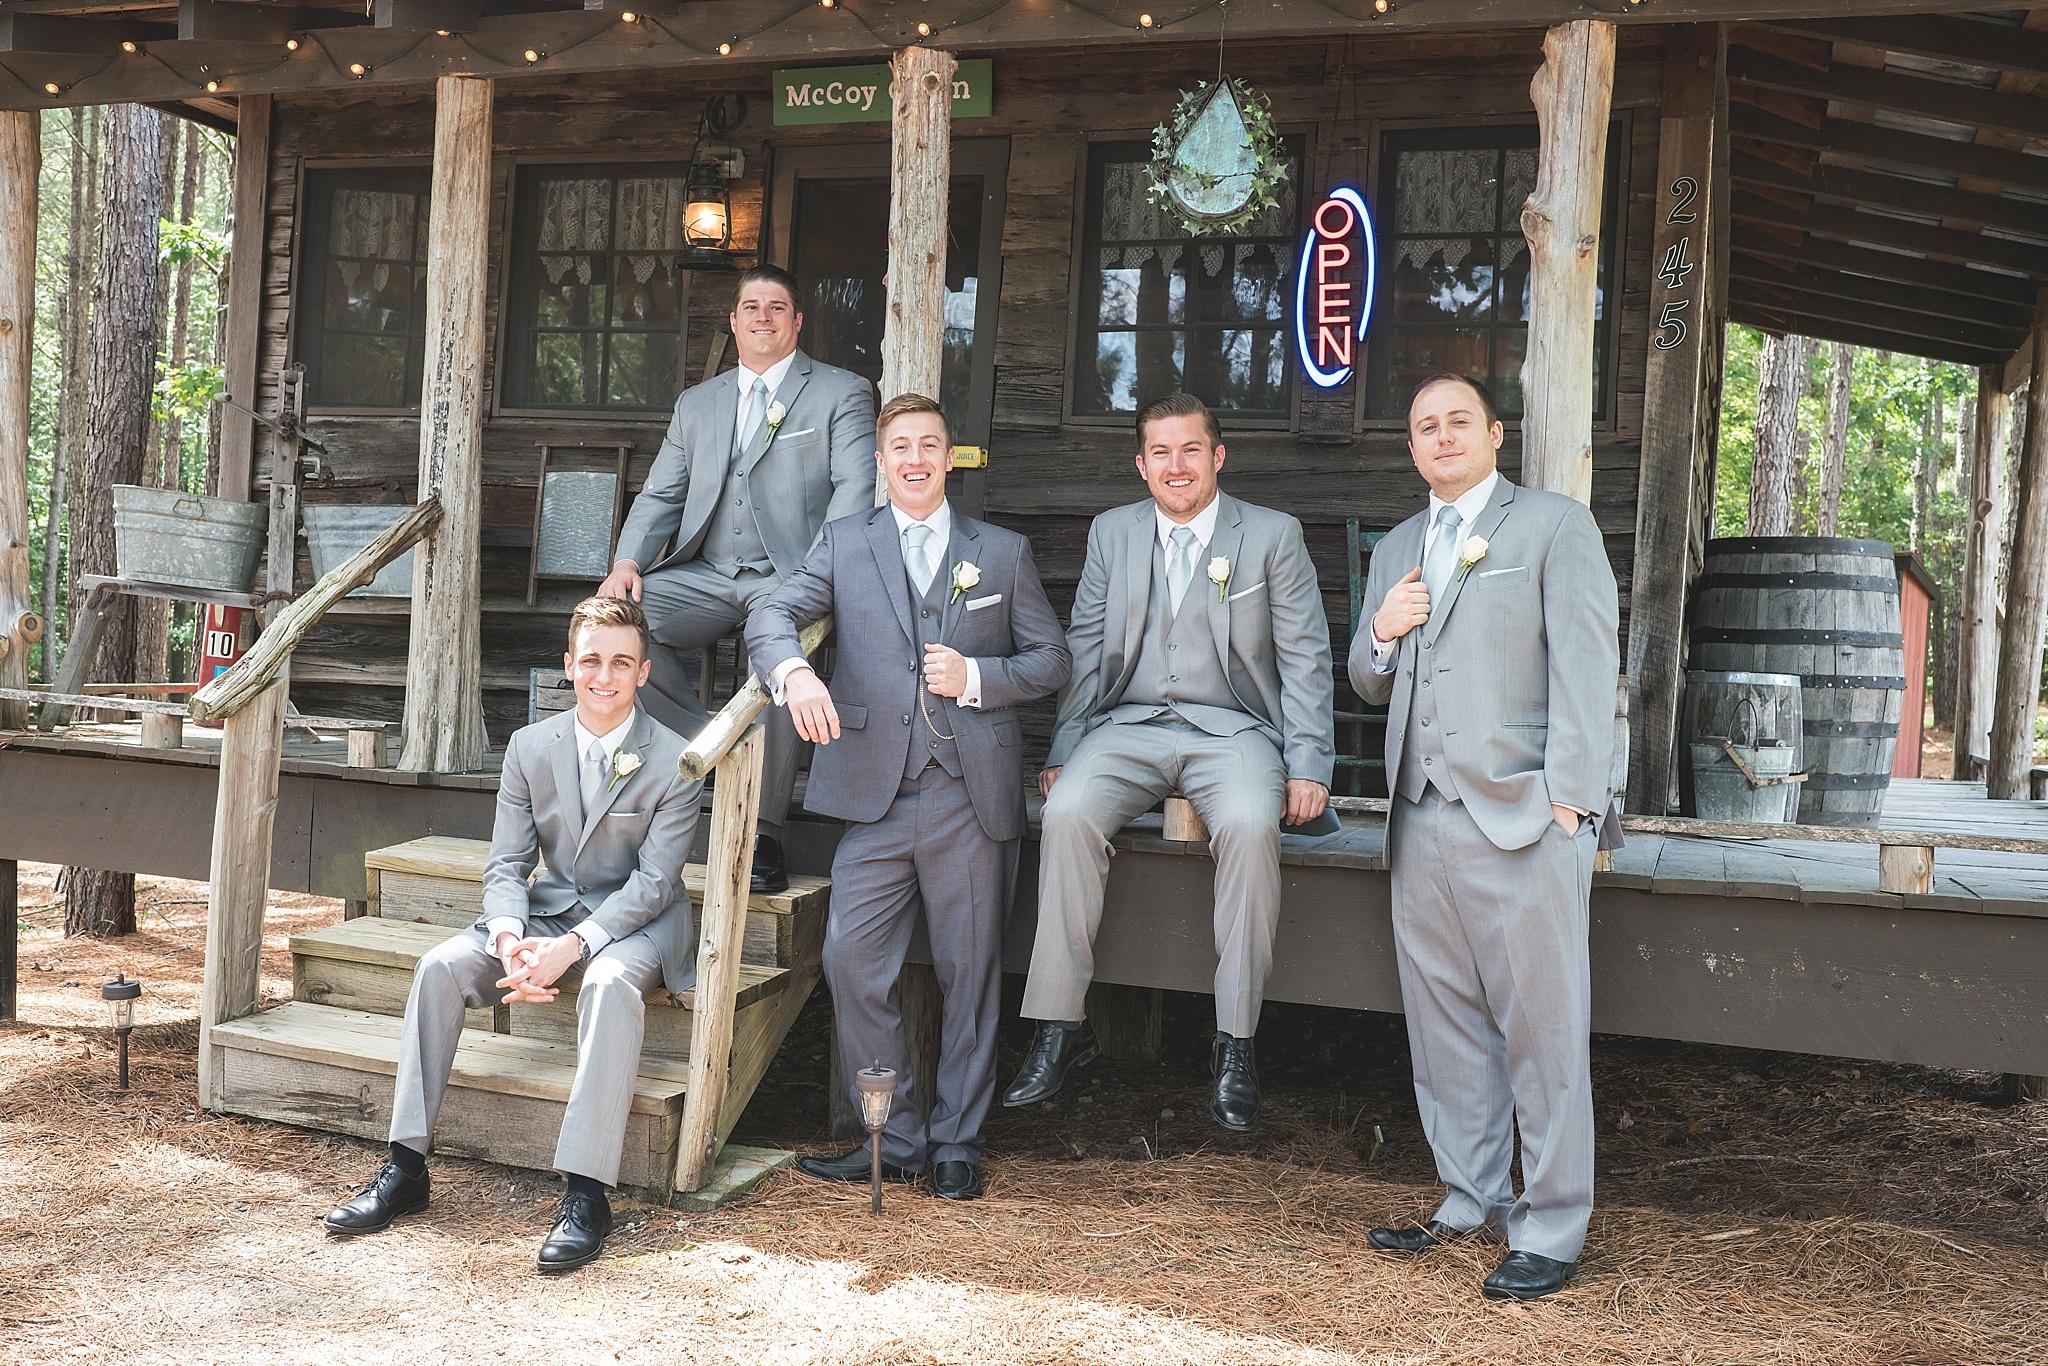 Shady-Wagon-Farm-NC-Wedding-Photographer-0158.jpg